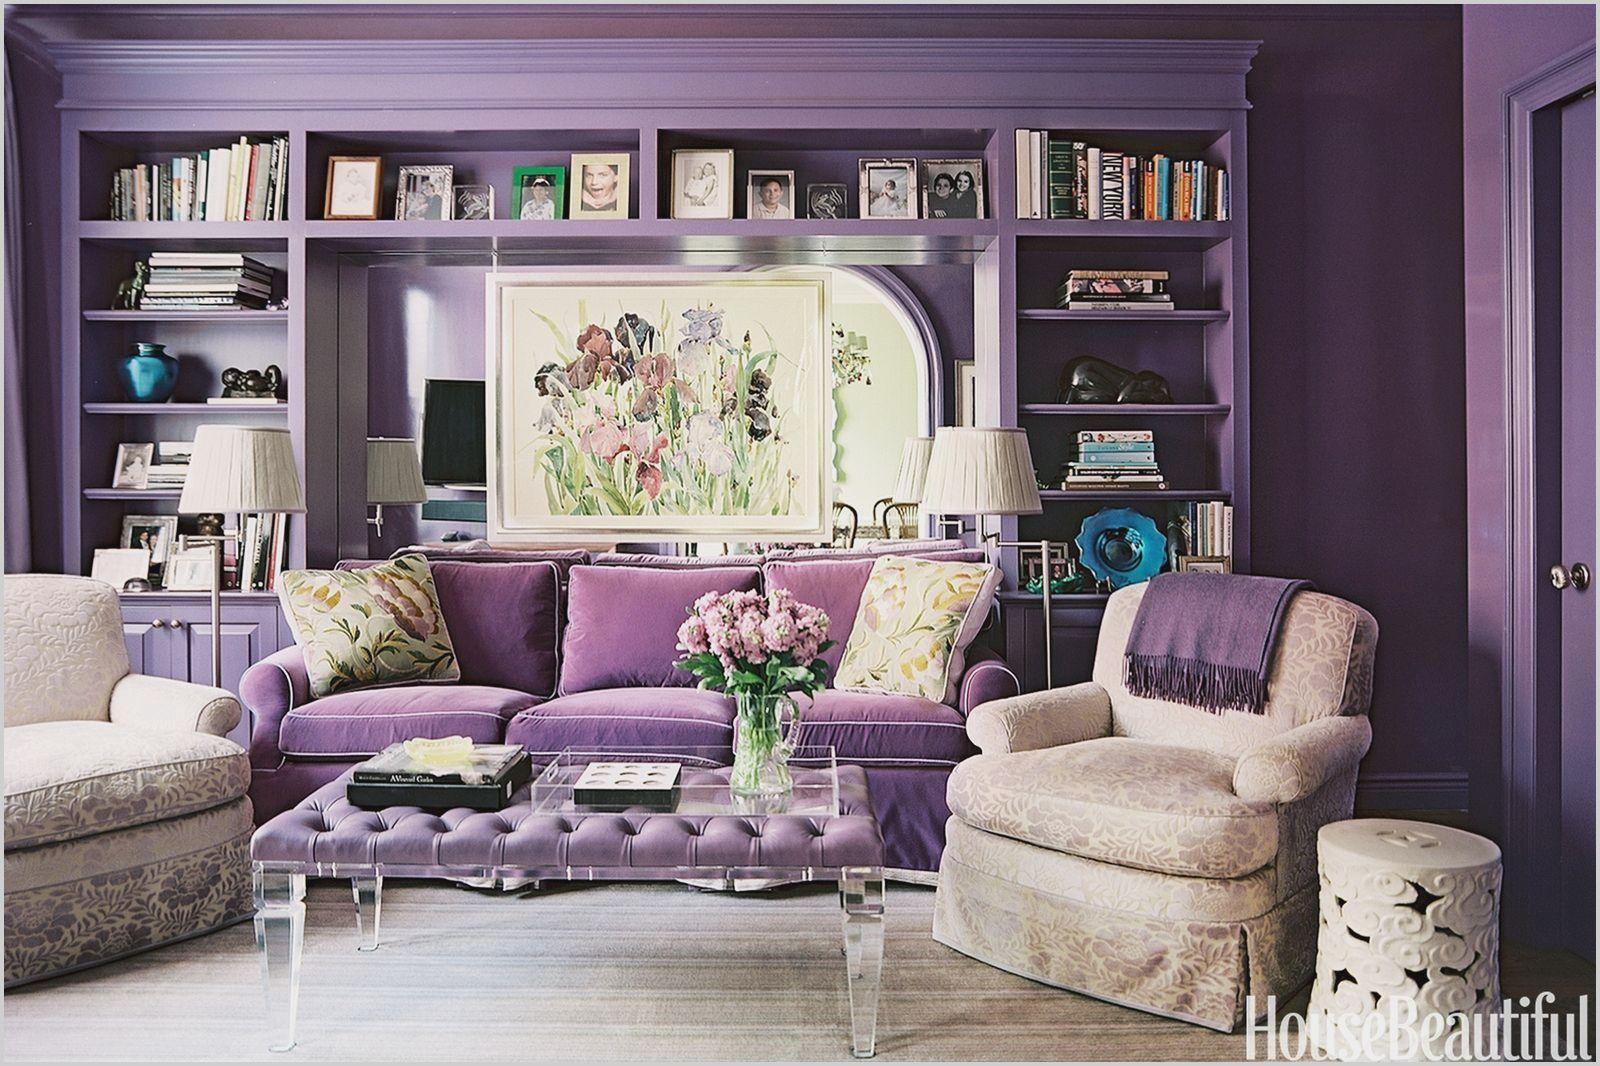 Beige And Purple Living Room Ideas In 2020 Purple Living